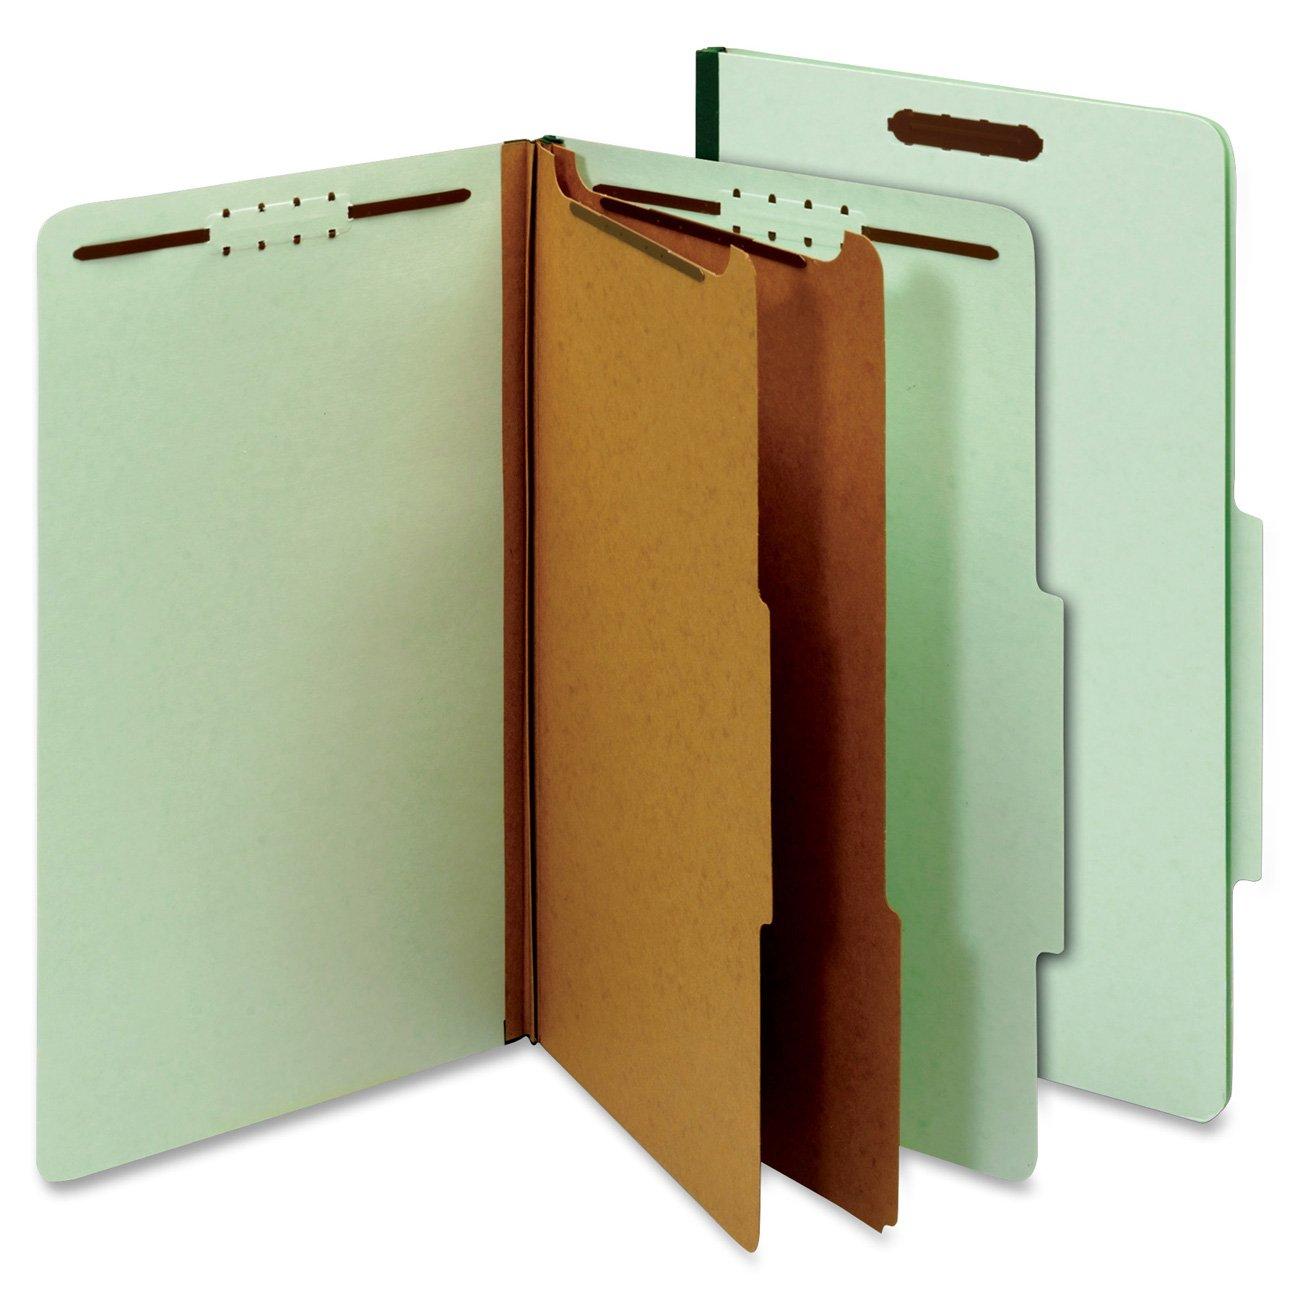 Globe-Weis 29076 Pressboard Clasificaci-n Carpetas-6 Cierres-2.5-Cut Legal-Green-10/Box